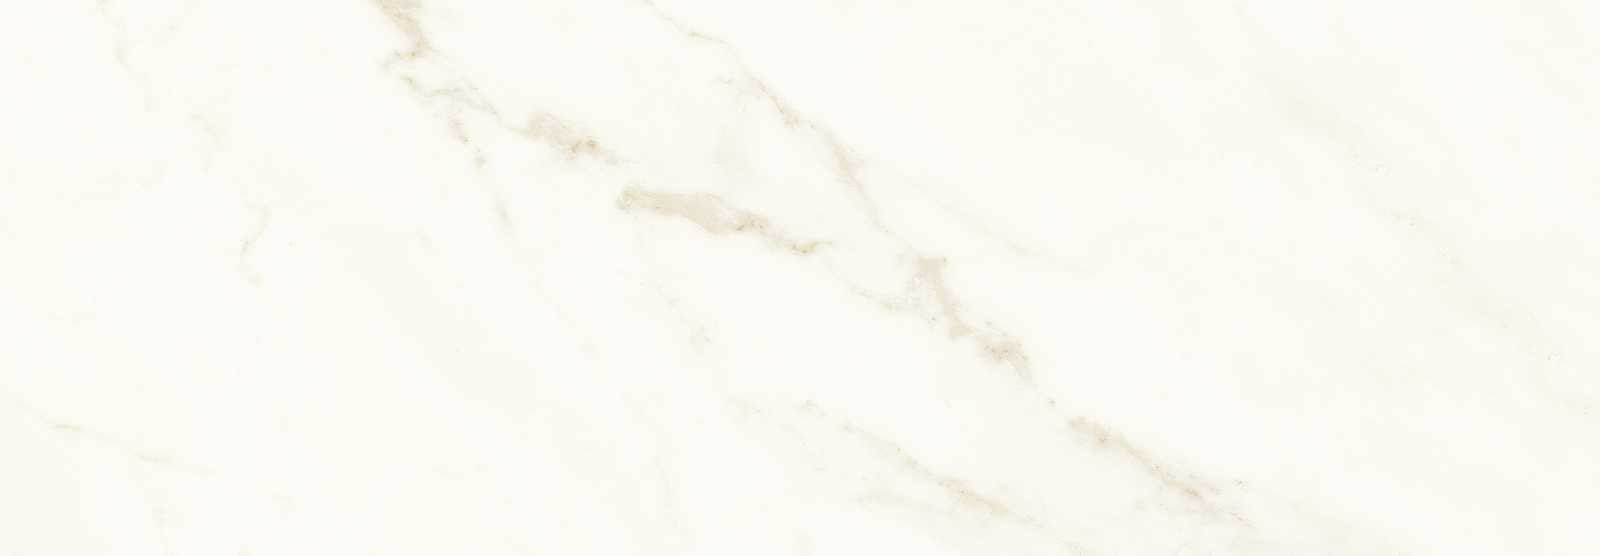 Стенни плочки Marbleplay Ivory 30x90